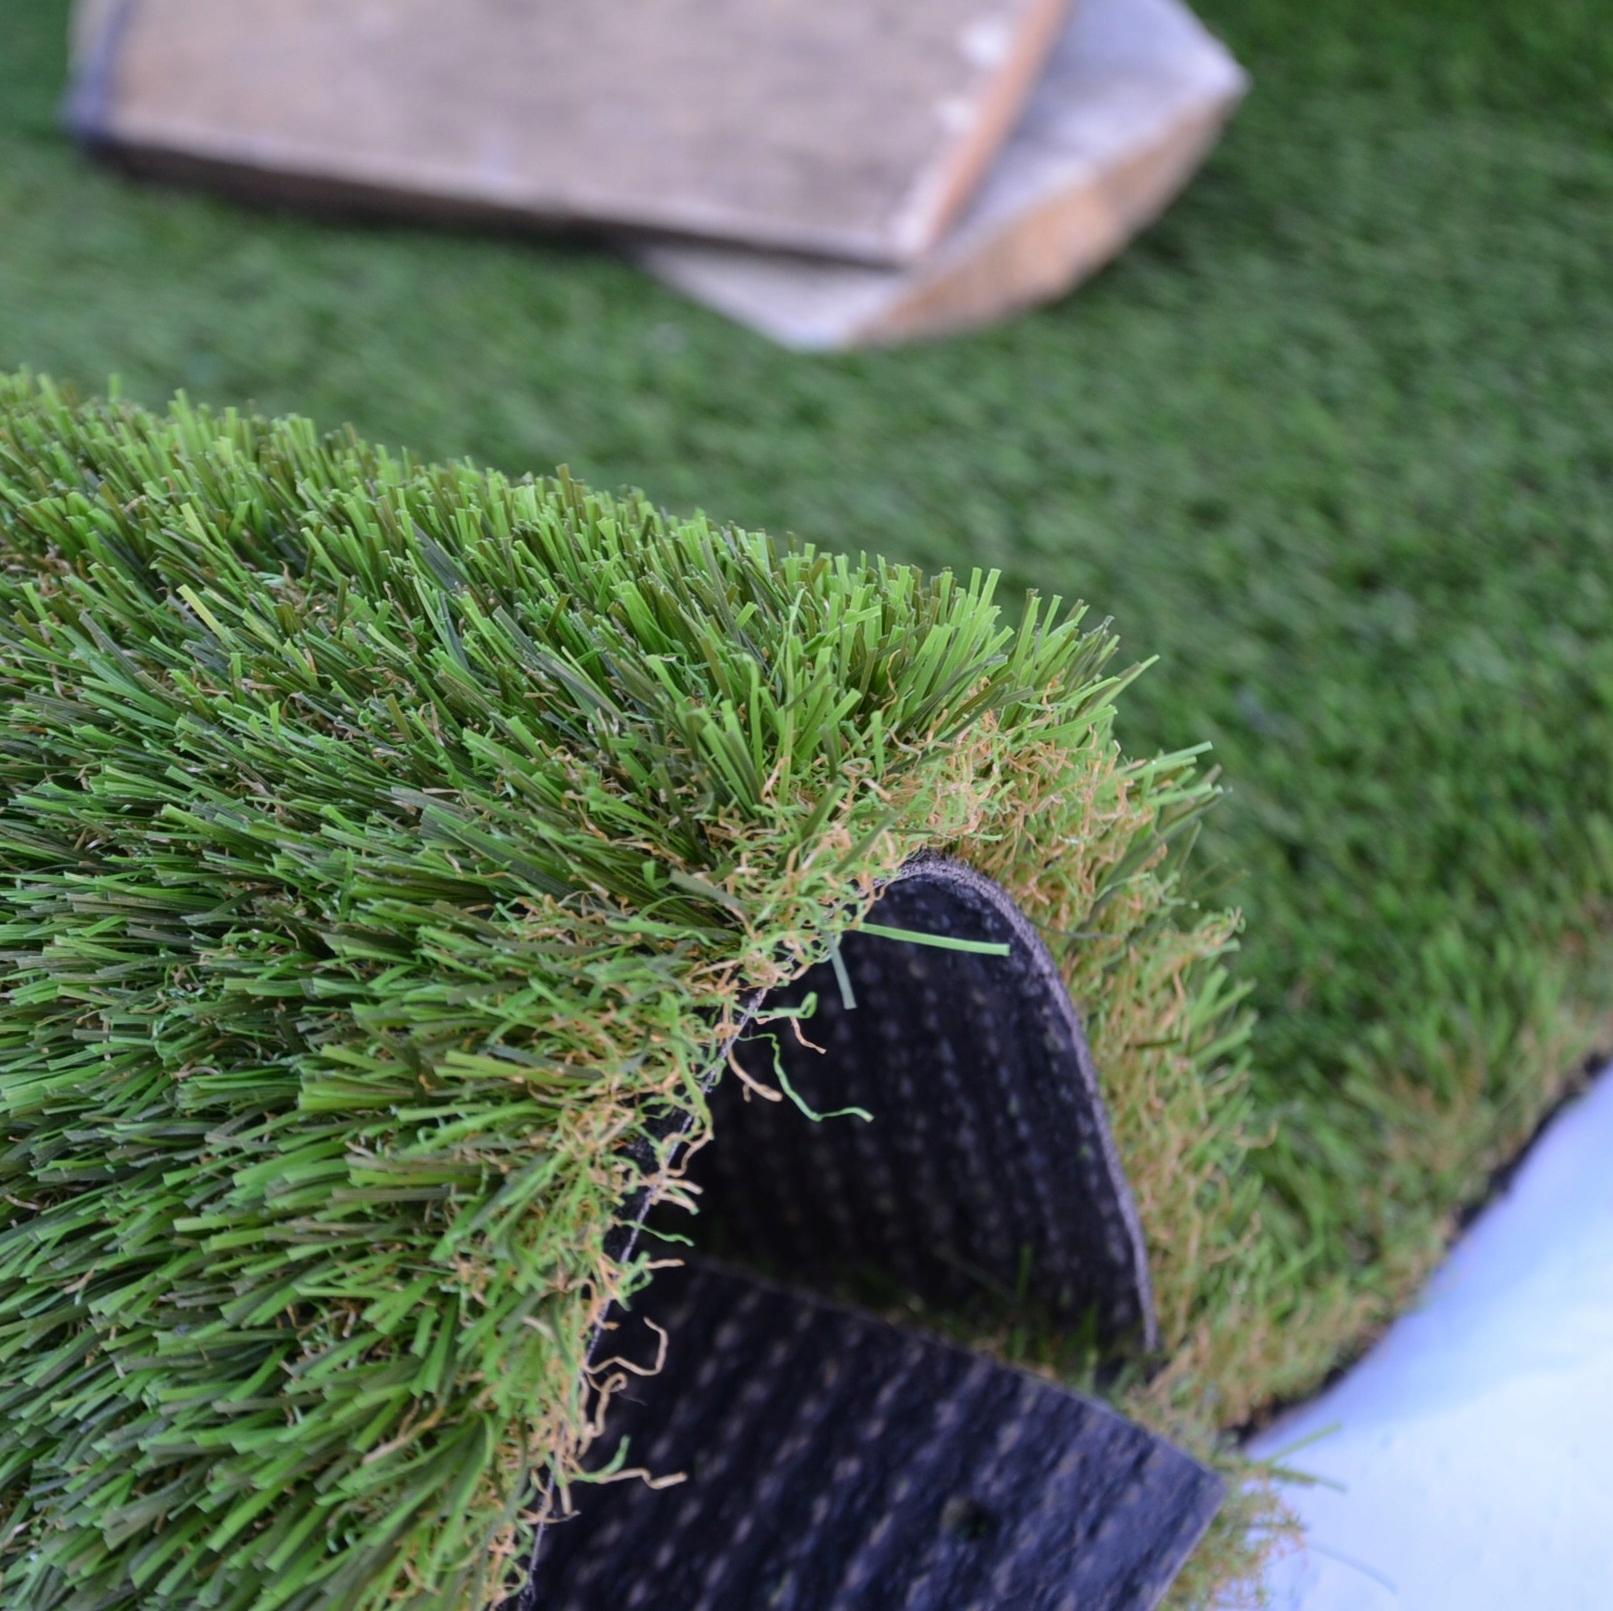 Koberec Umelá tráva CABANA| hrubé| 40 mm| záhrada|200x850